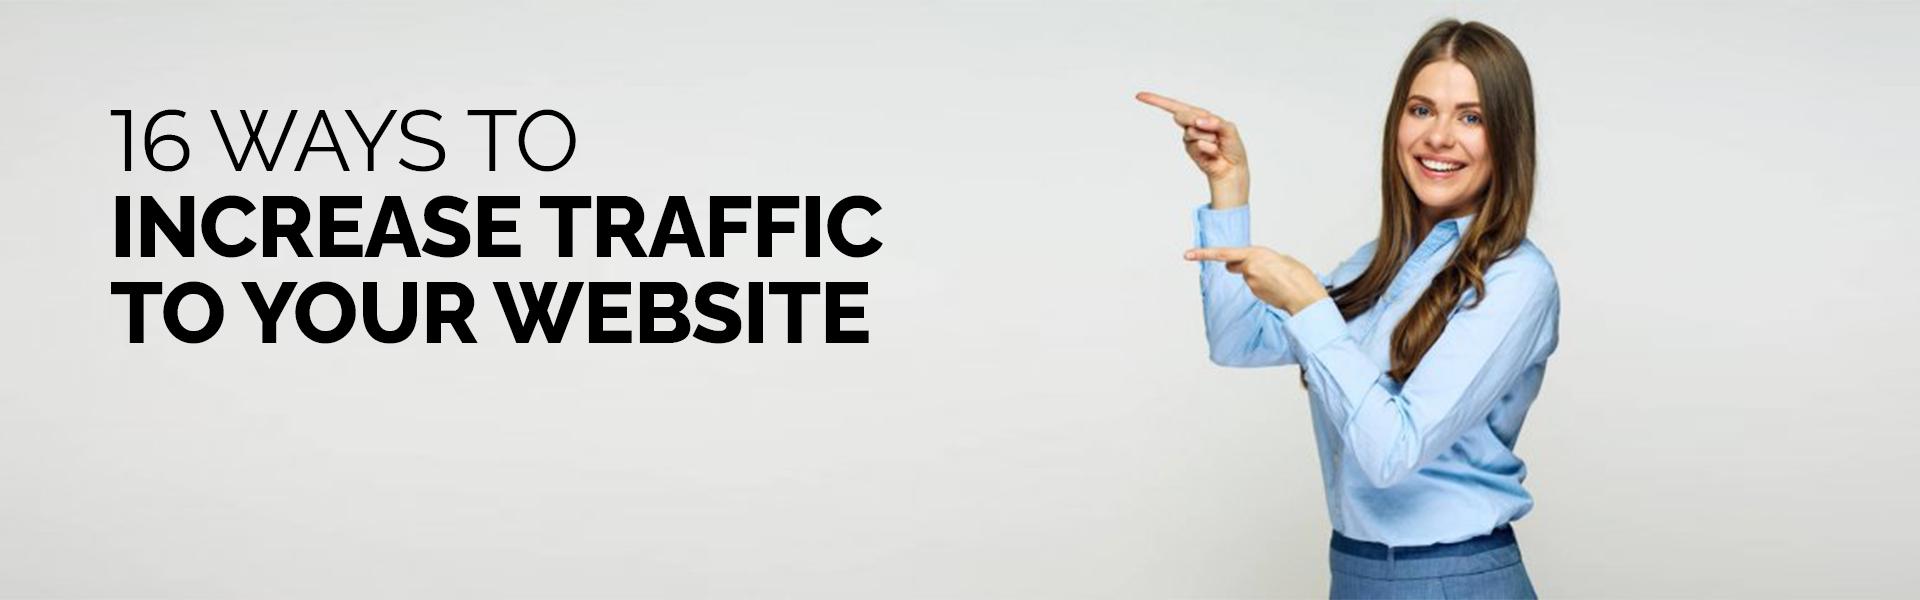 Increase website traffic -banner